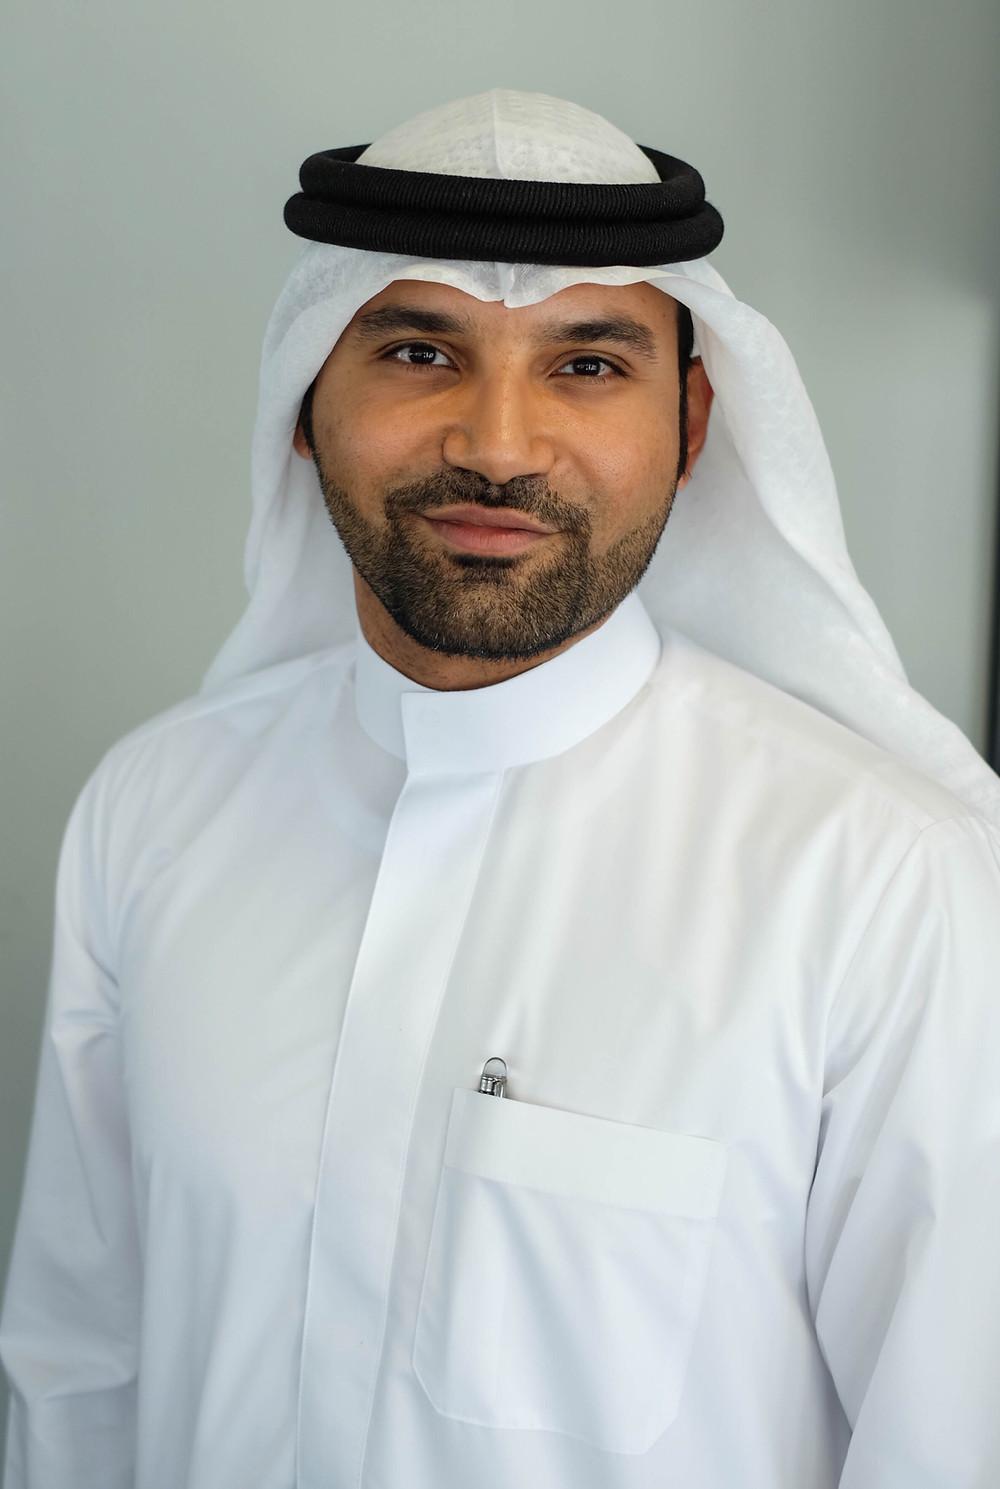 Khalid Saad, CEO of Bahrain FinTech Bay